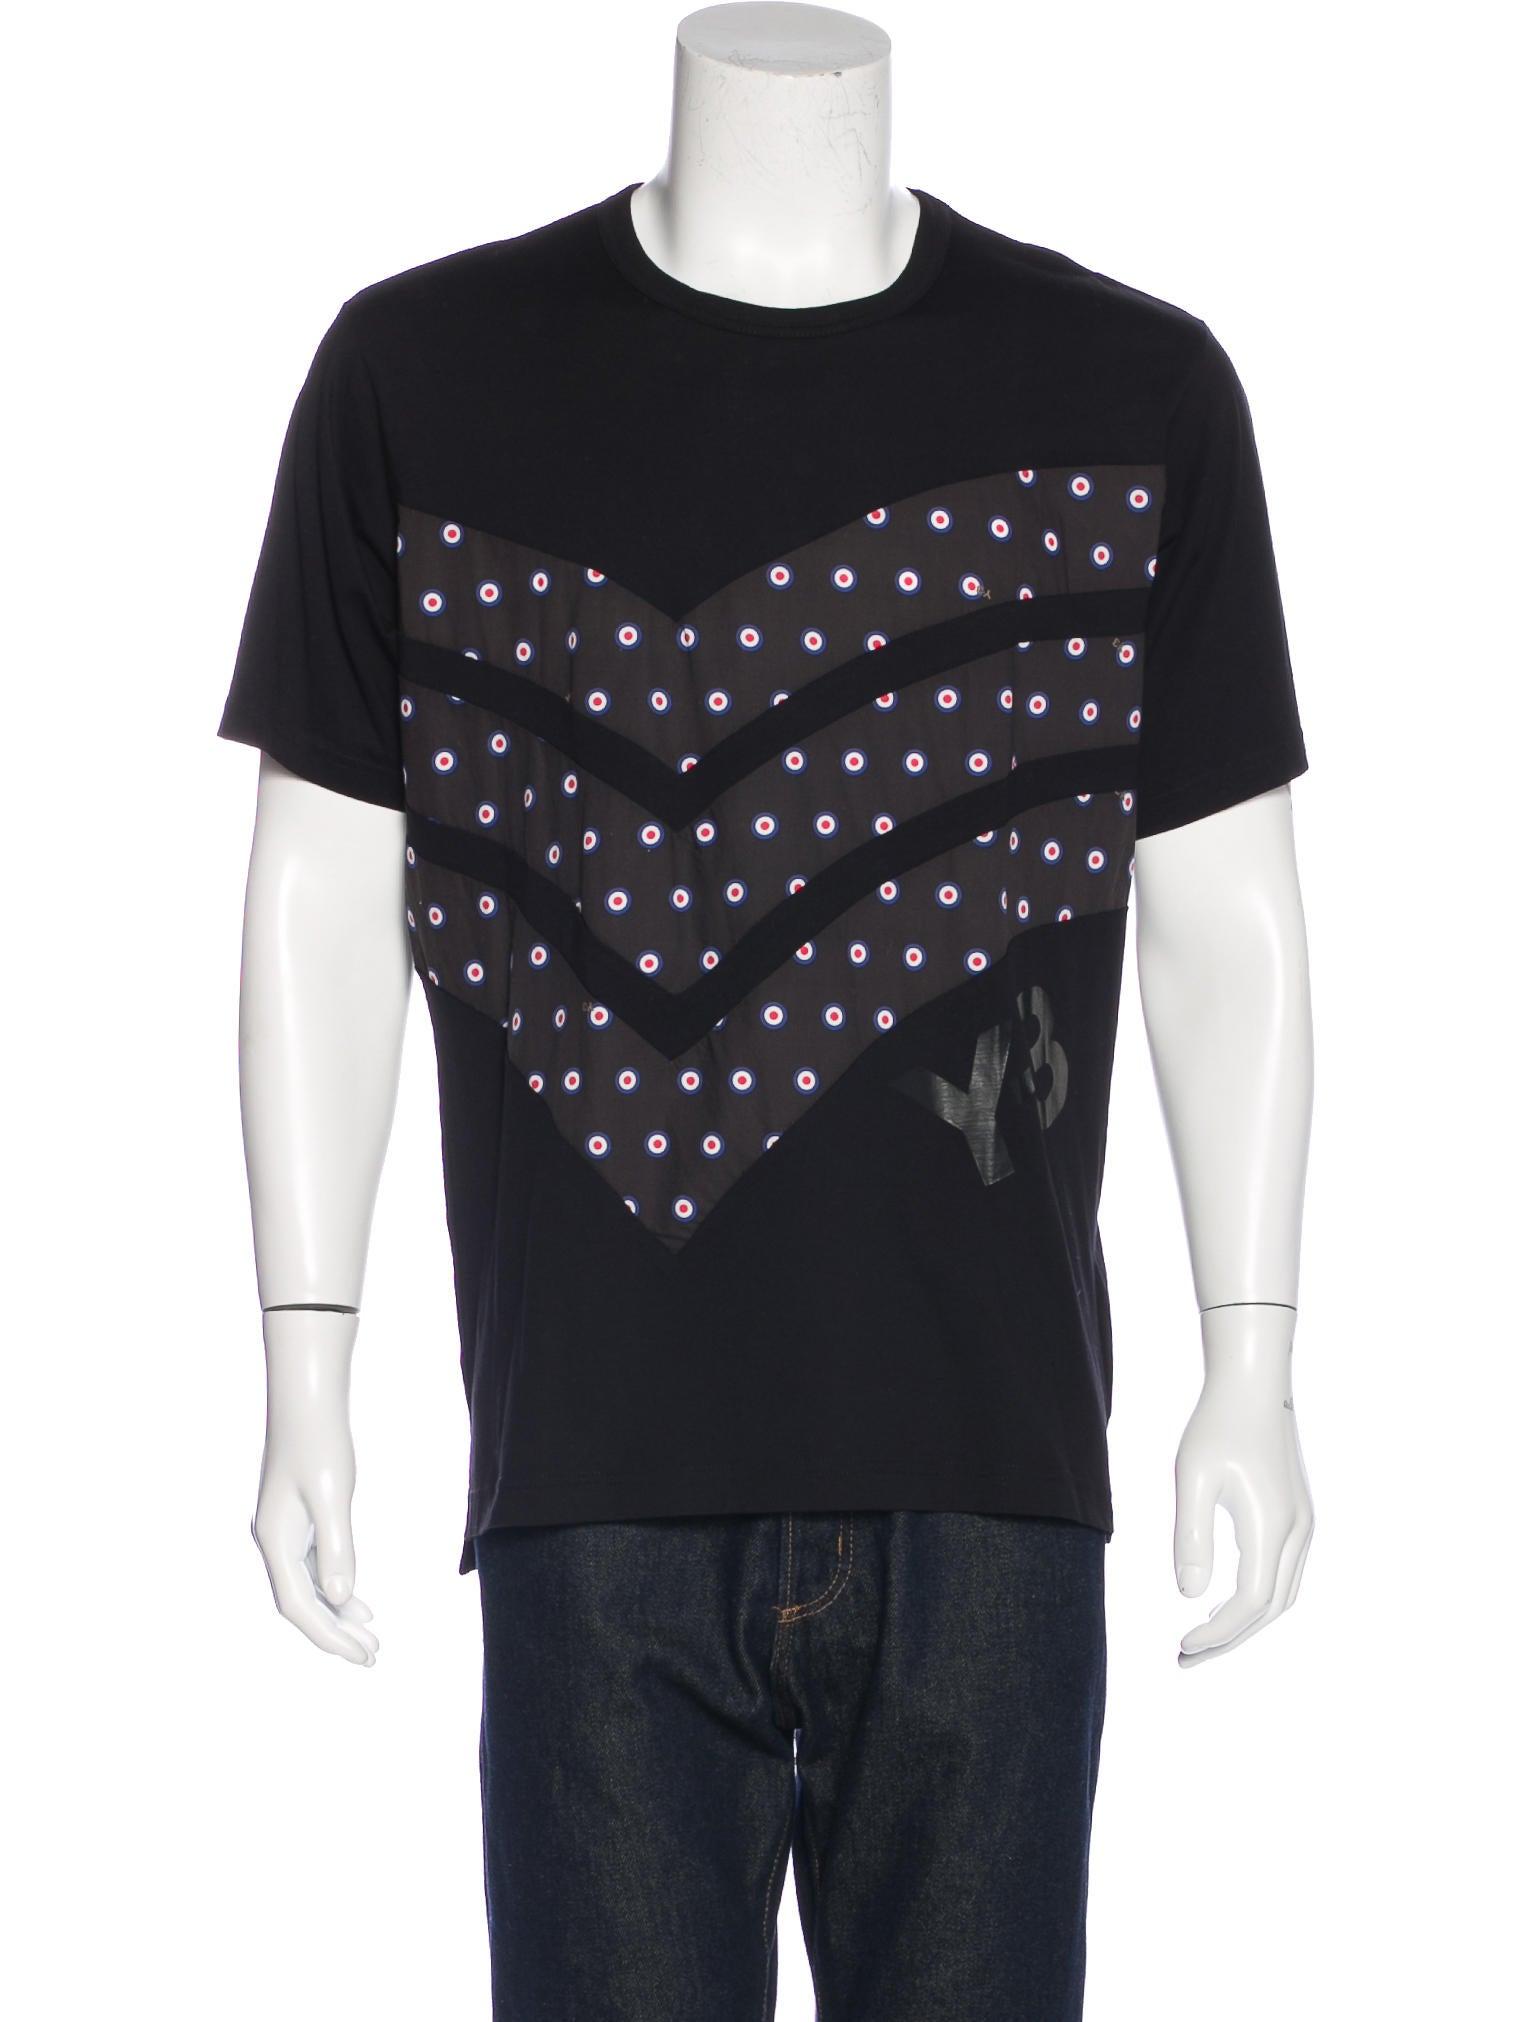 Y 3 striped polka dot t shirt w tags clothing for Three dots t shirts